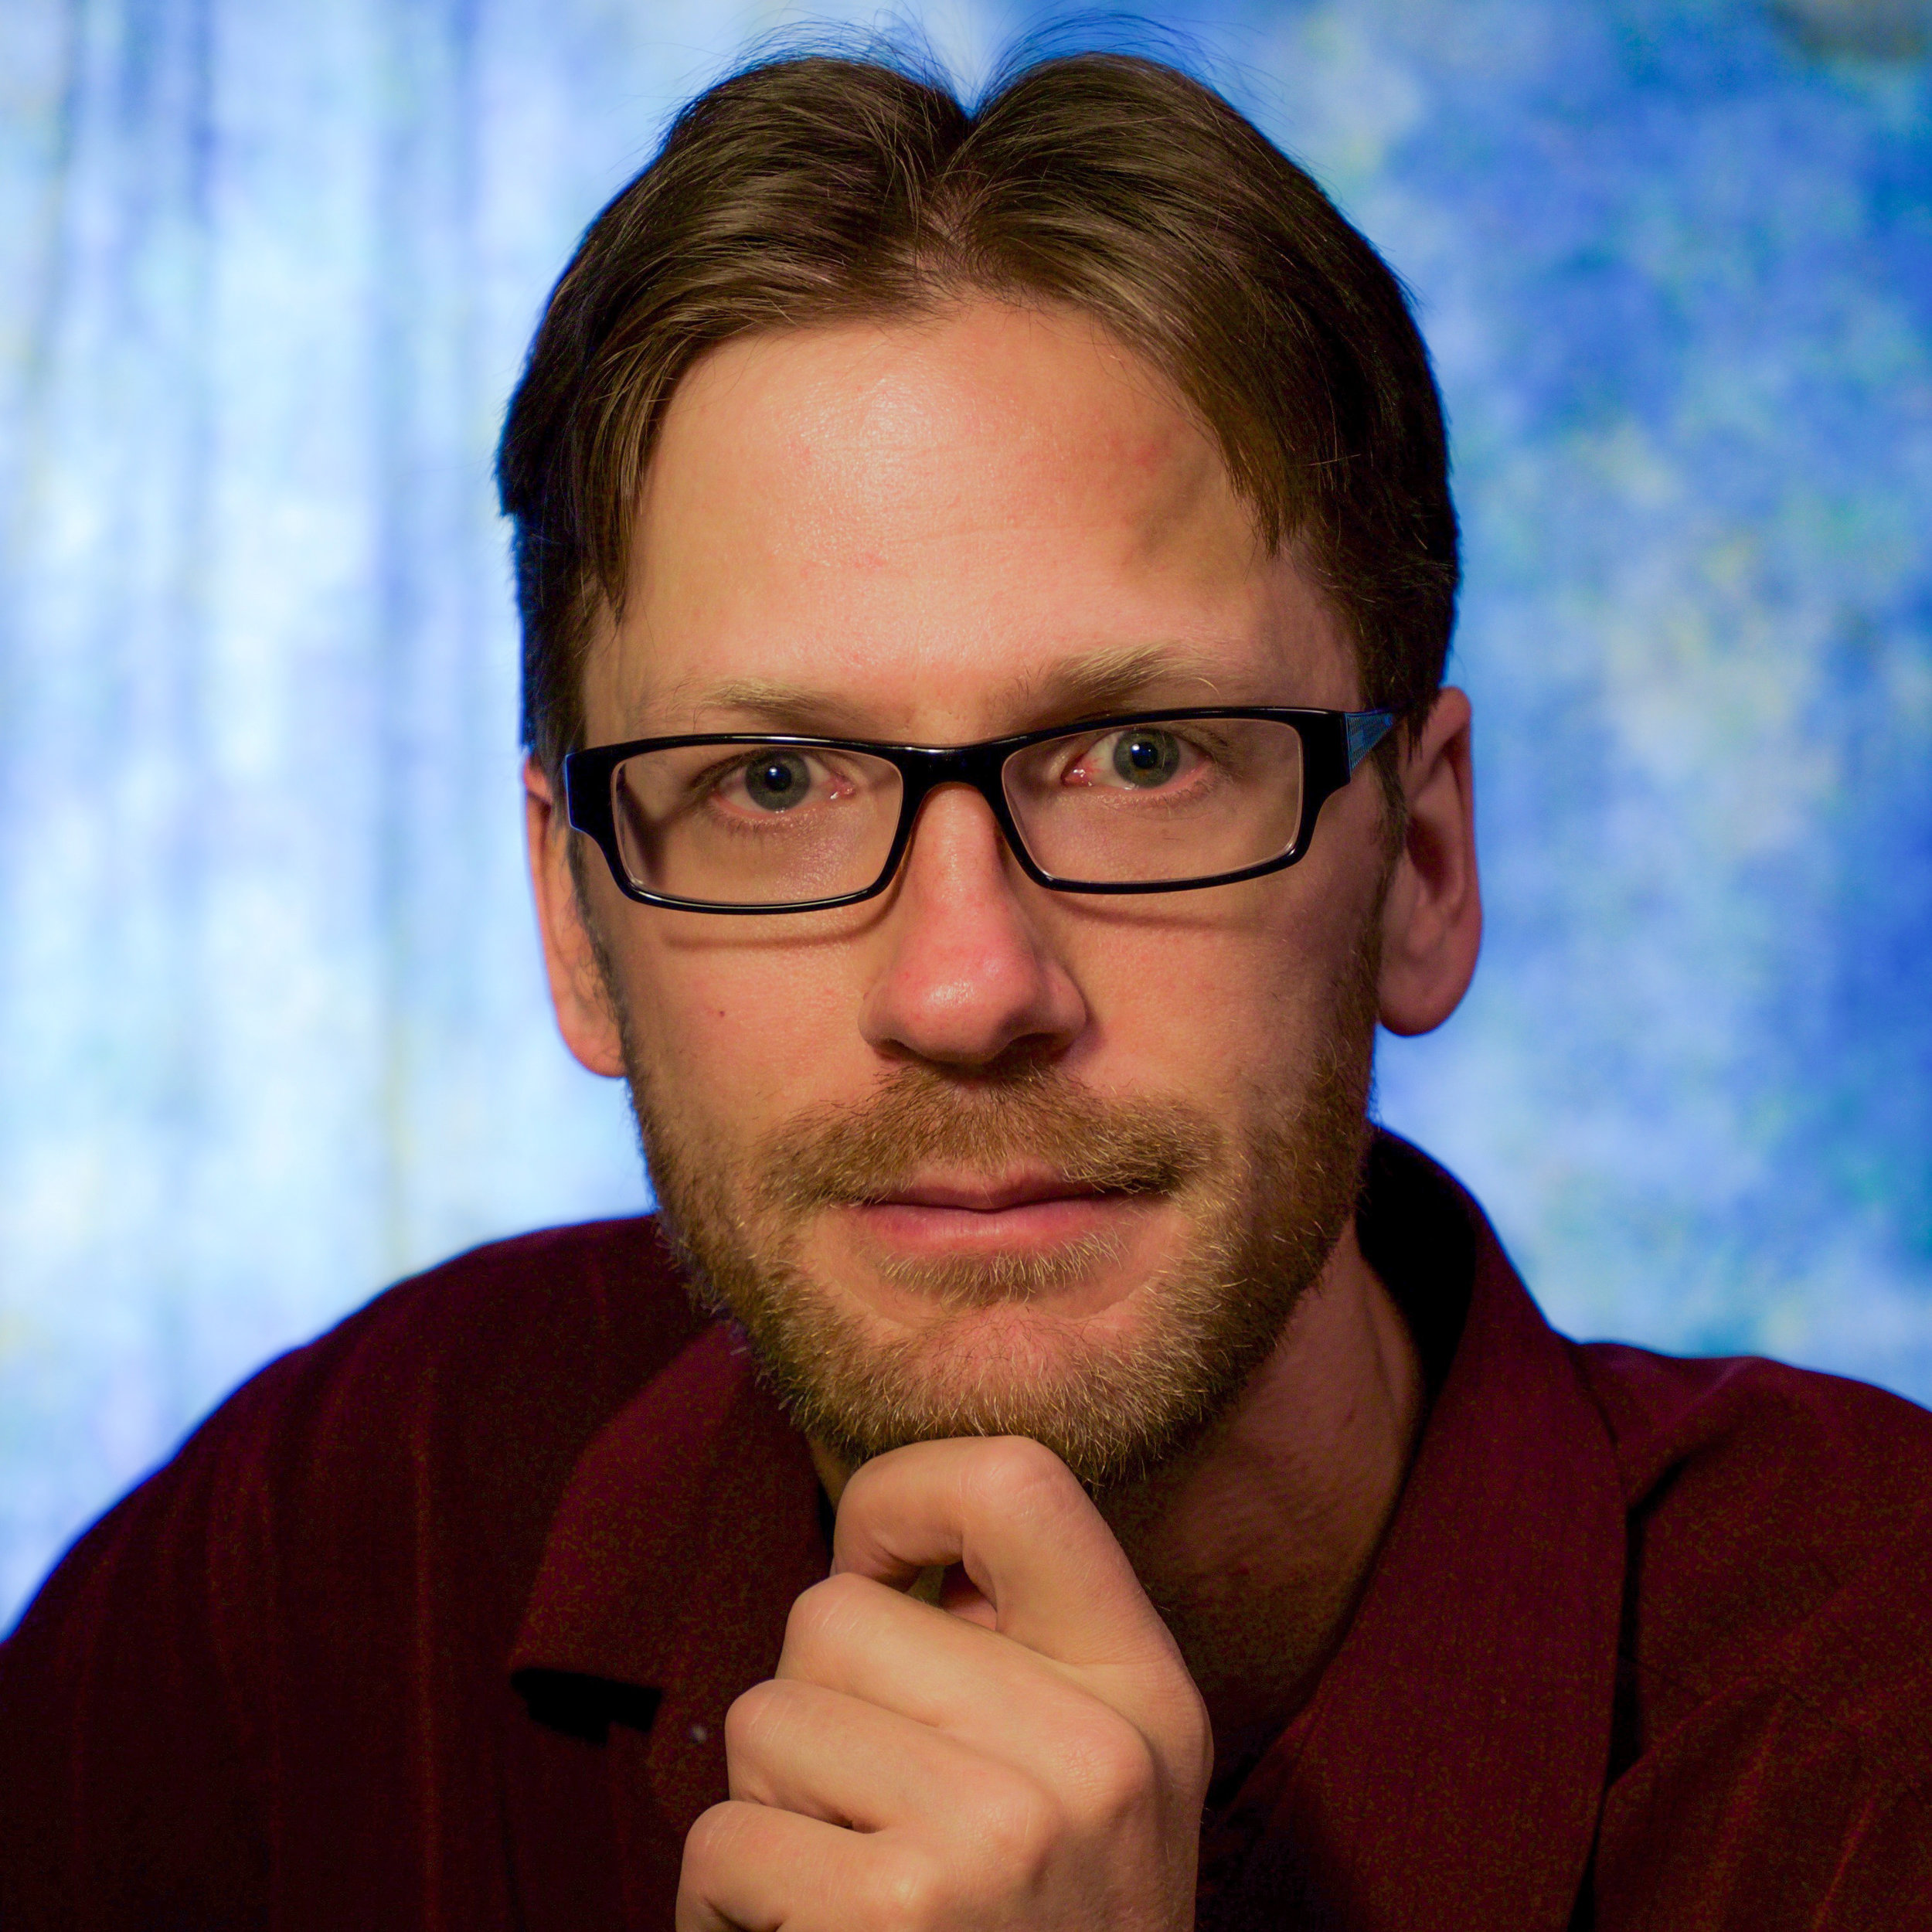 John Profile 1.jpg